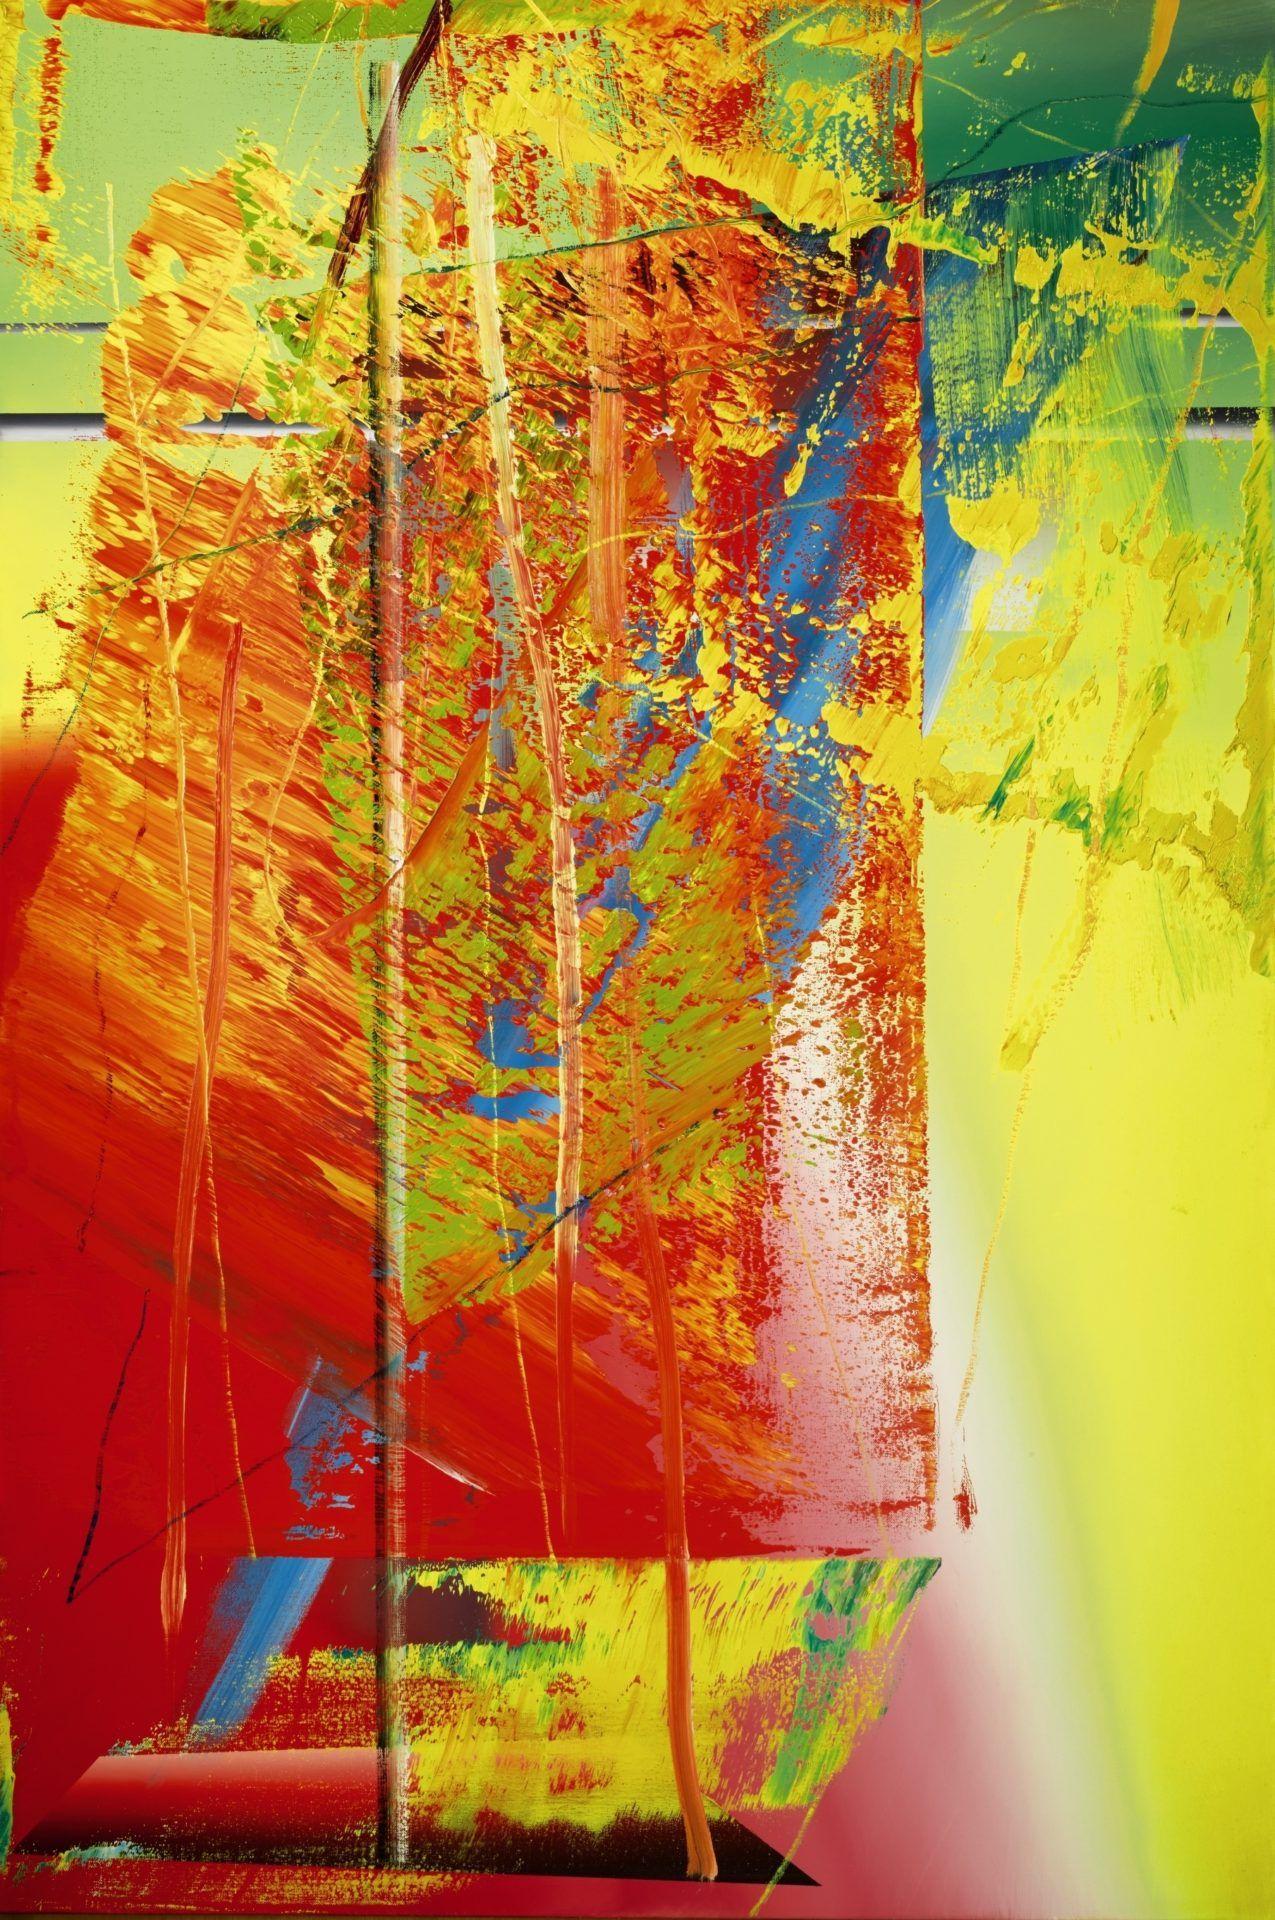 gerhard richter abstraktes bild 1986 courtesy of sotheby s abstract famous artists abstrakte bilder blau bunte